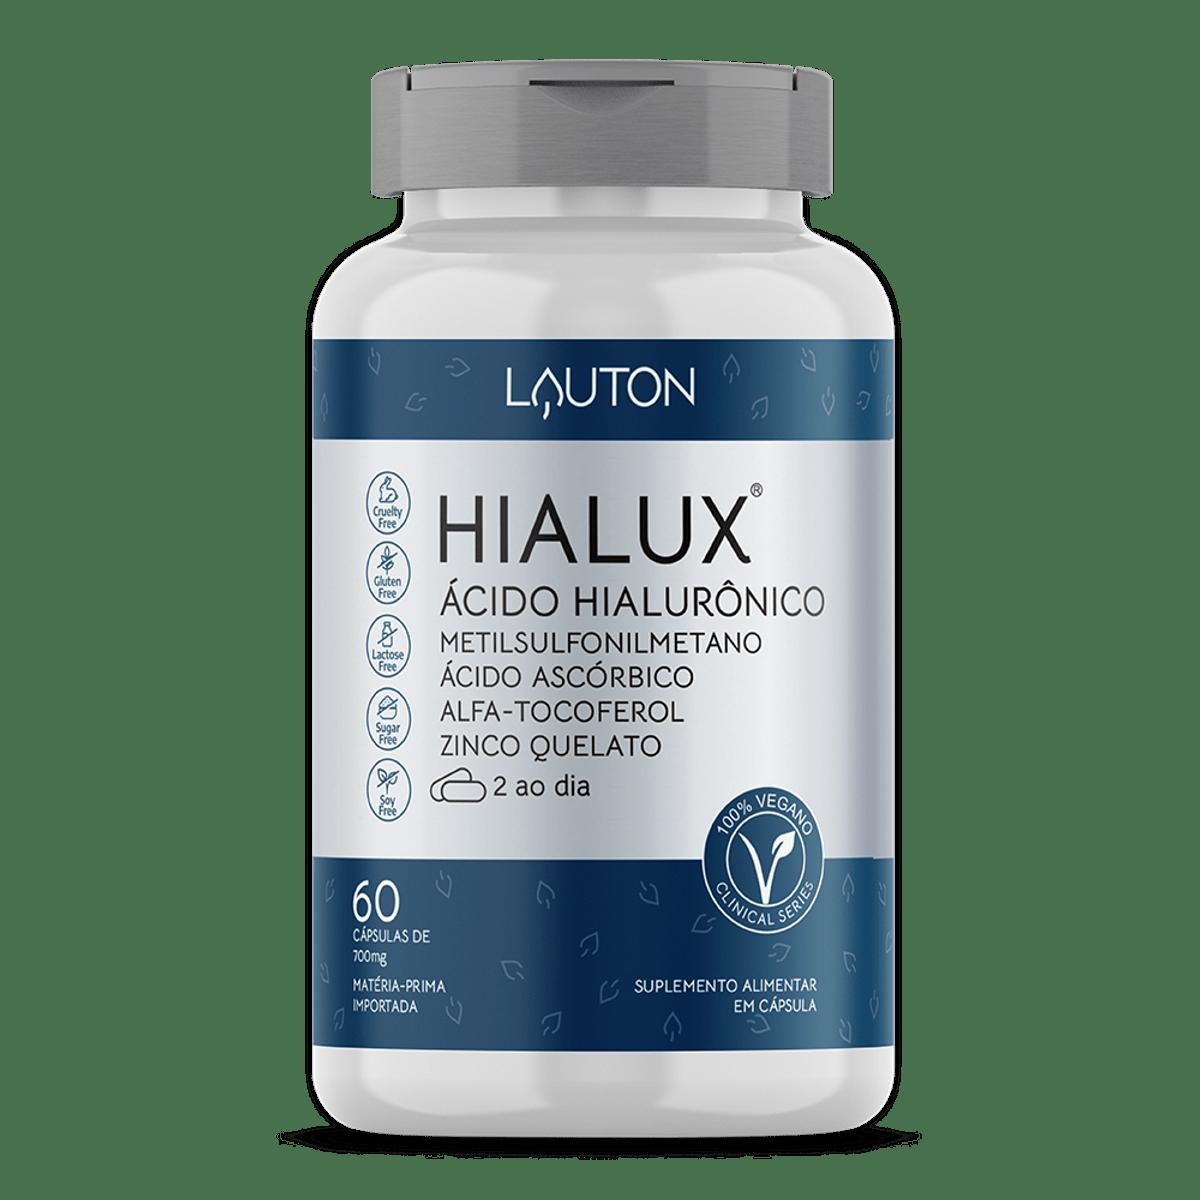 Hialux - Ácido Hialurônico - 60 Cápsulas - Lauton Nutrition